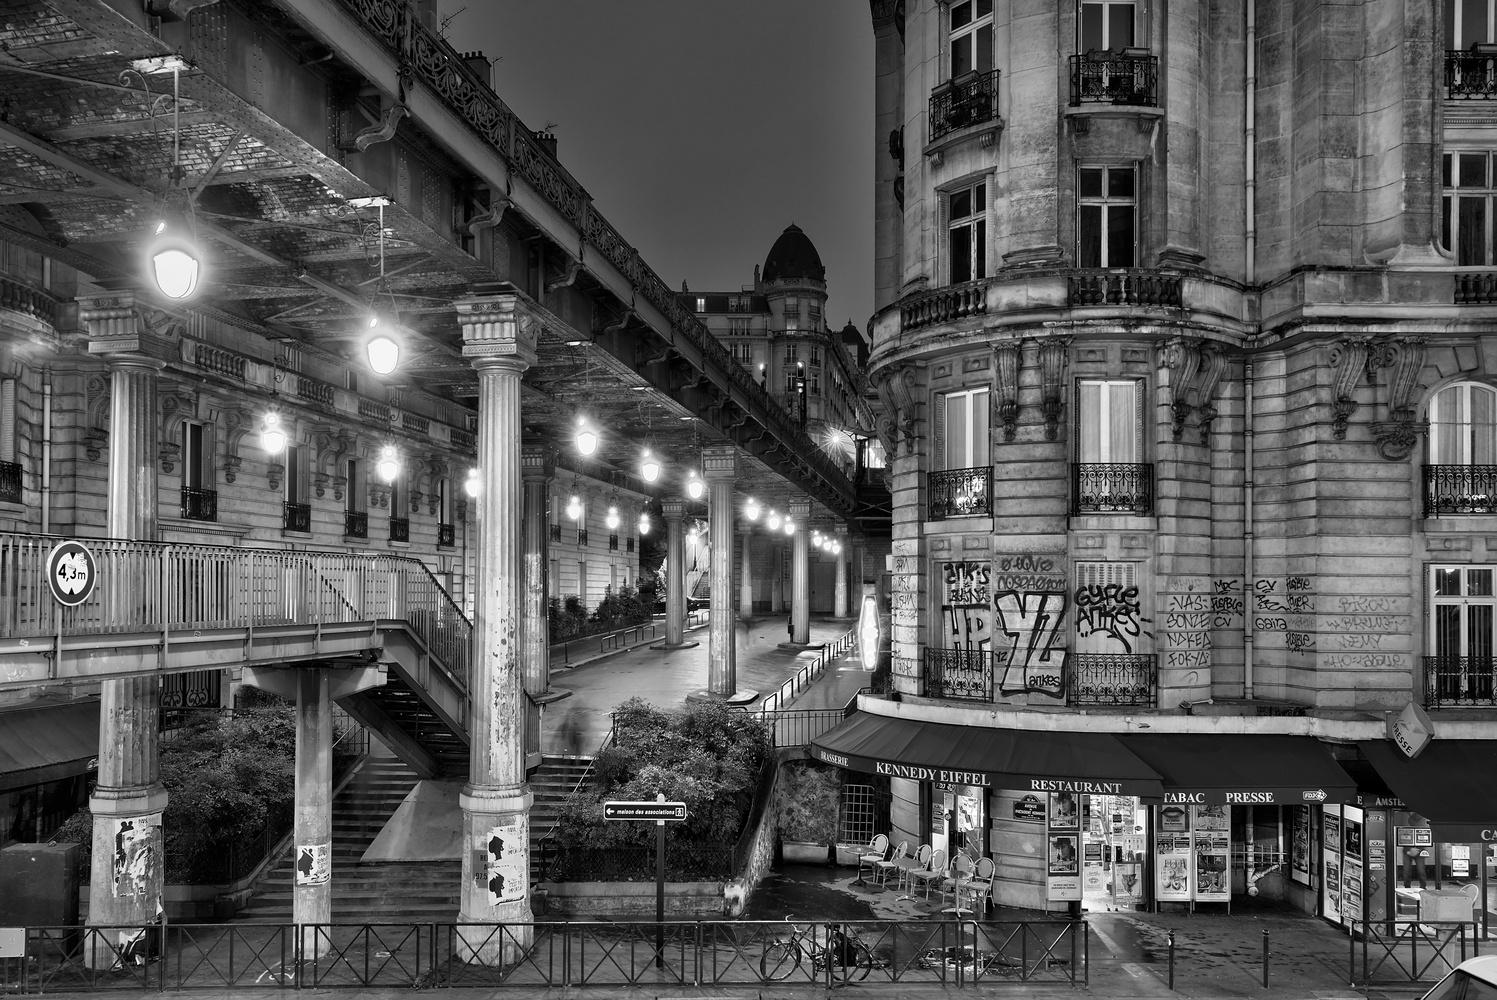 Paris intersection by Steve Gould